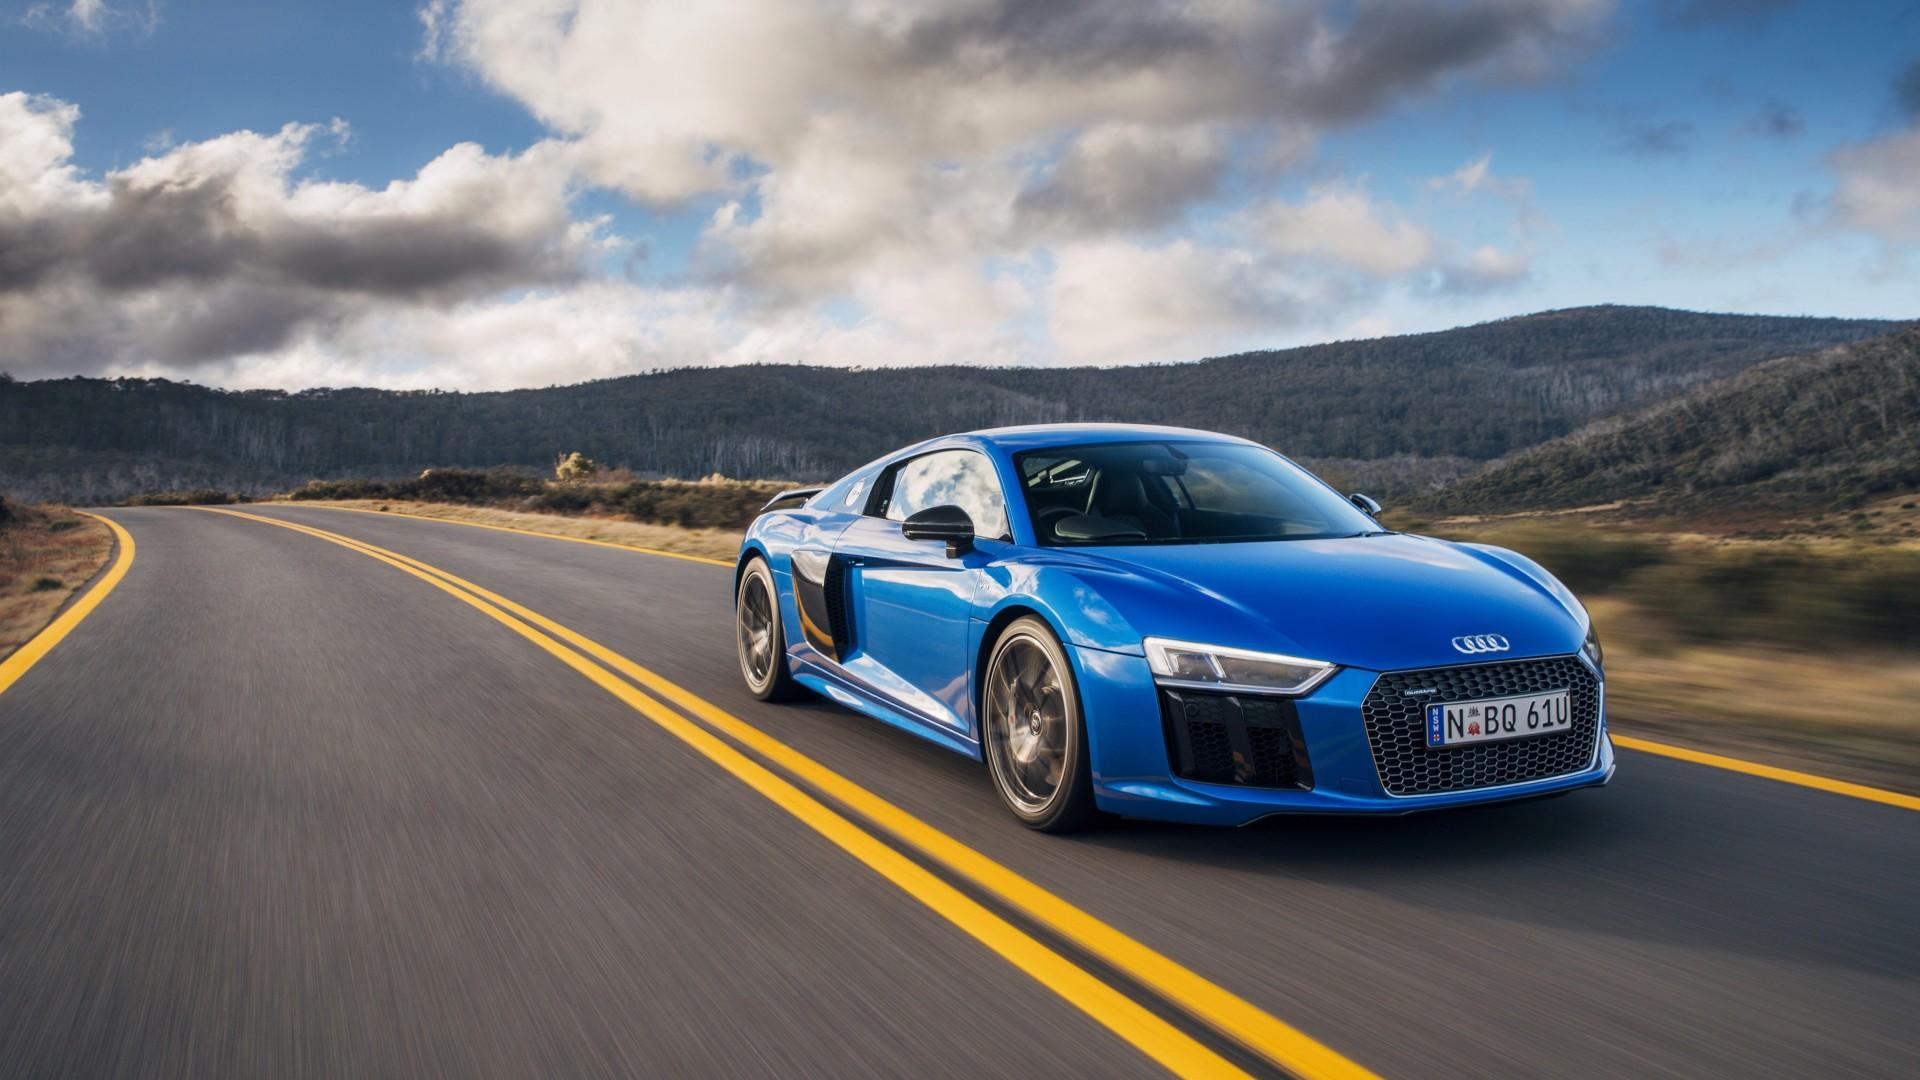 2016 Audi R8 4K Wallpaper | HD Car Wallpapers | ID #6829